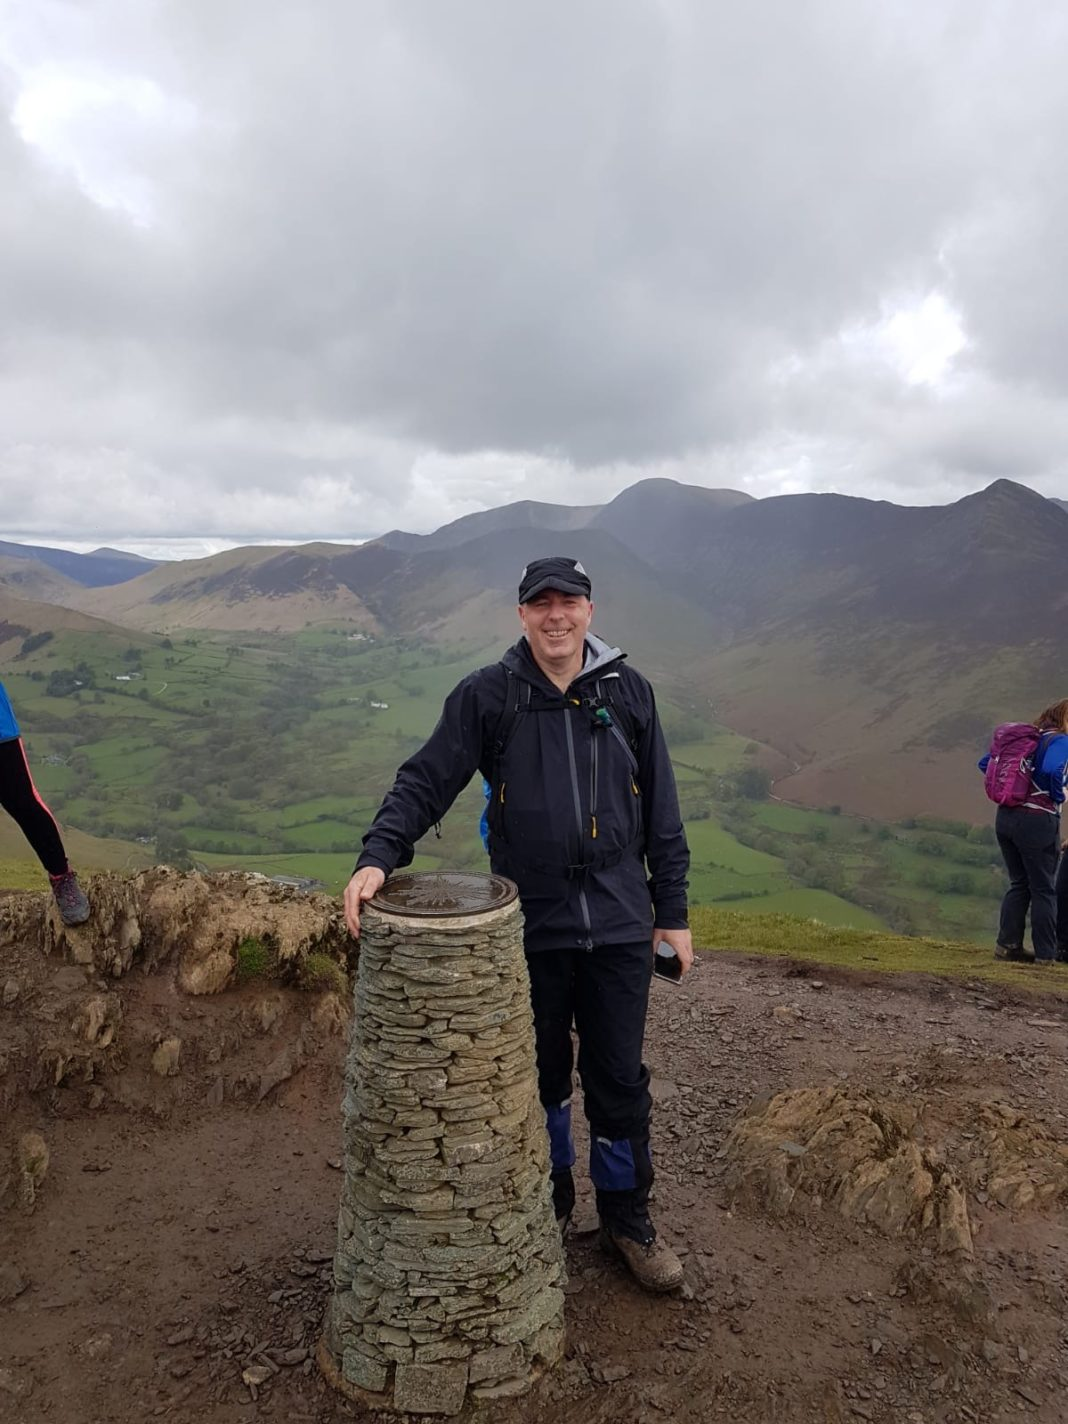 Brain Tumor Patient Preparing To Take On Yorkshire Three Peaks